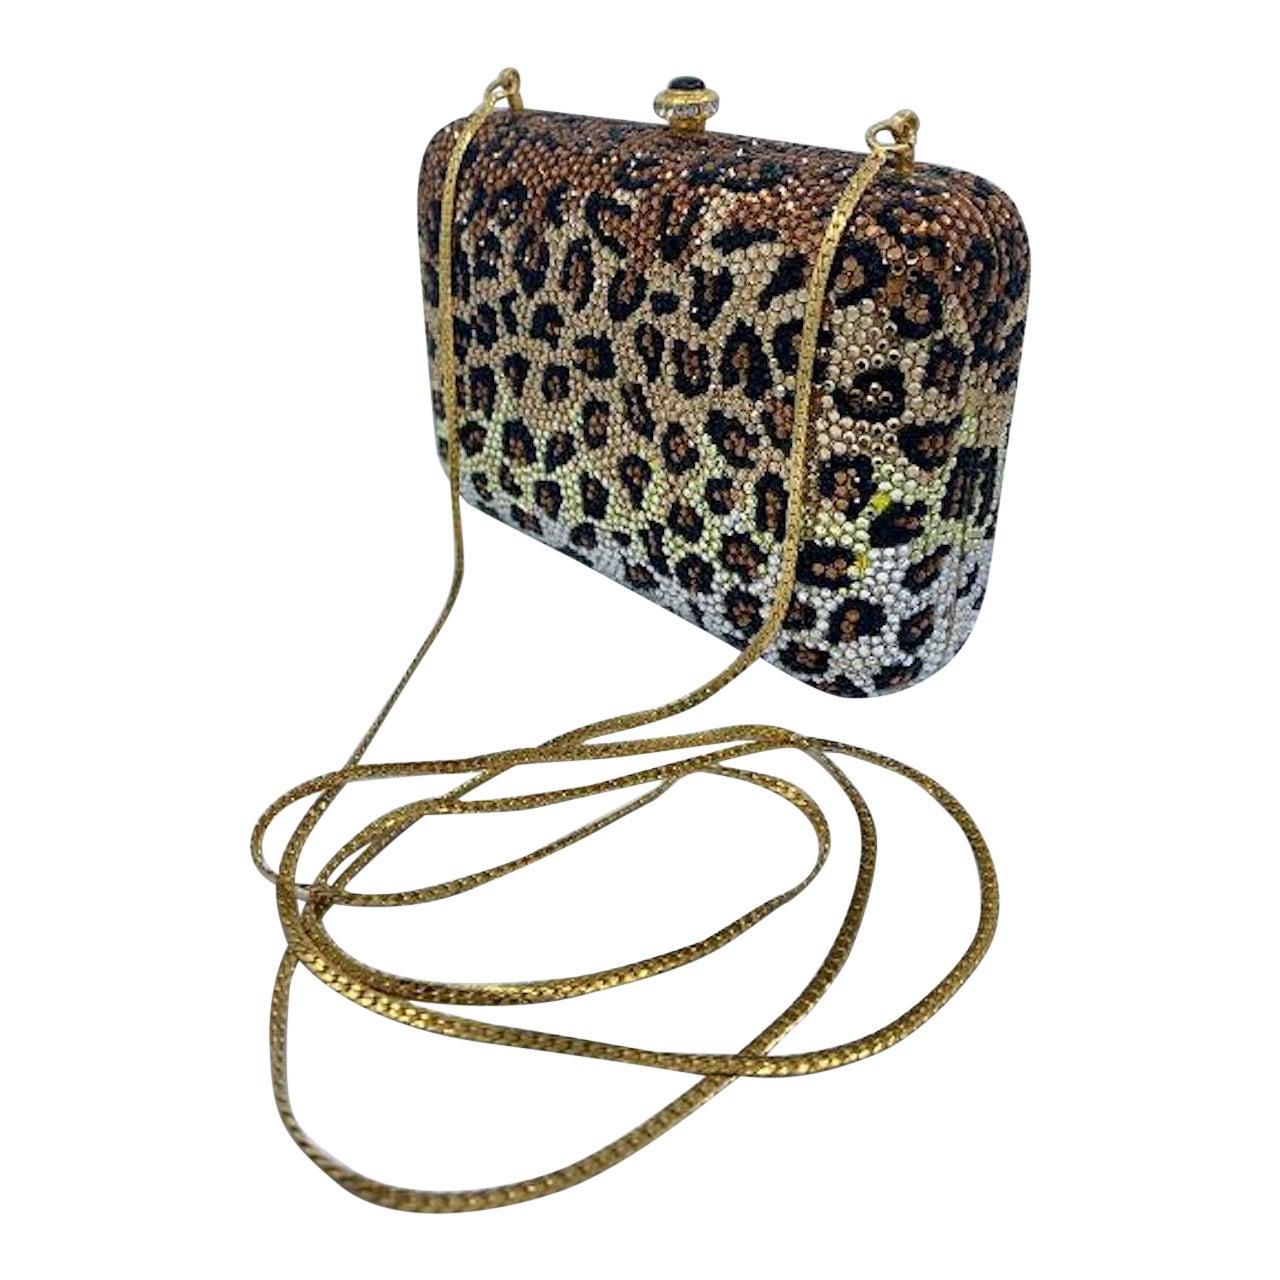 Kathrine Baumann Leopard Design Swarovski Crystal Minaudiere Evening Bag